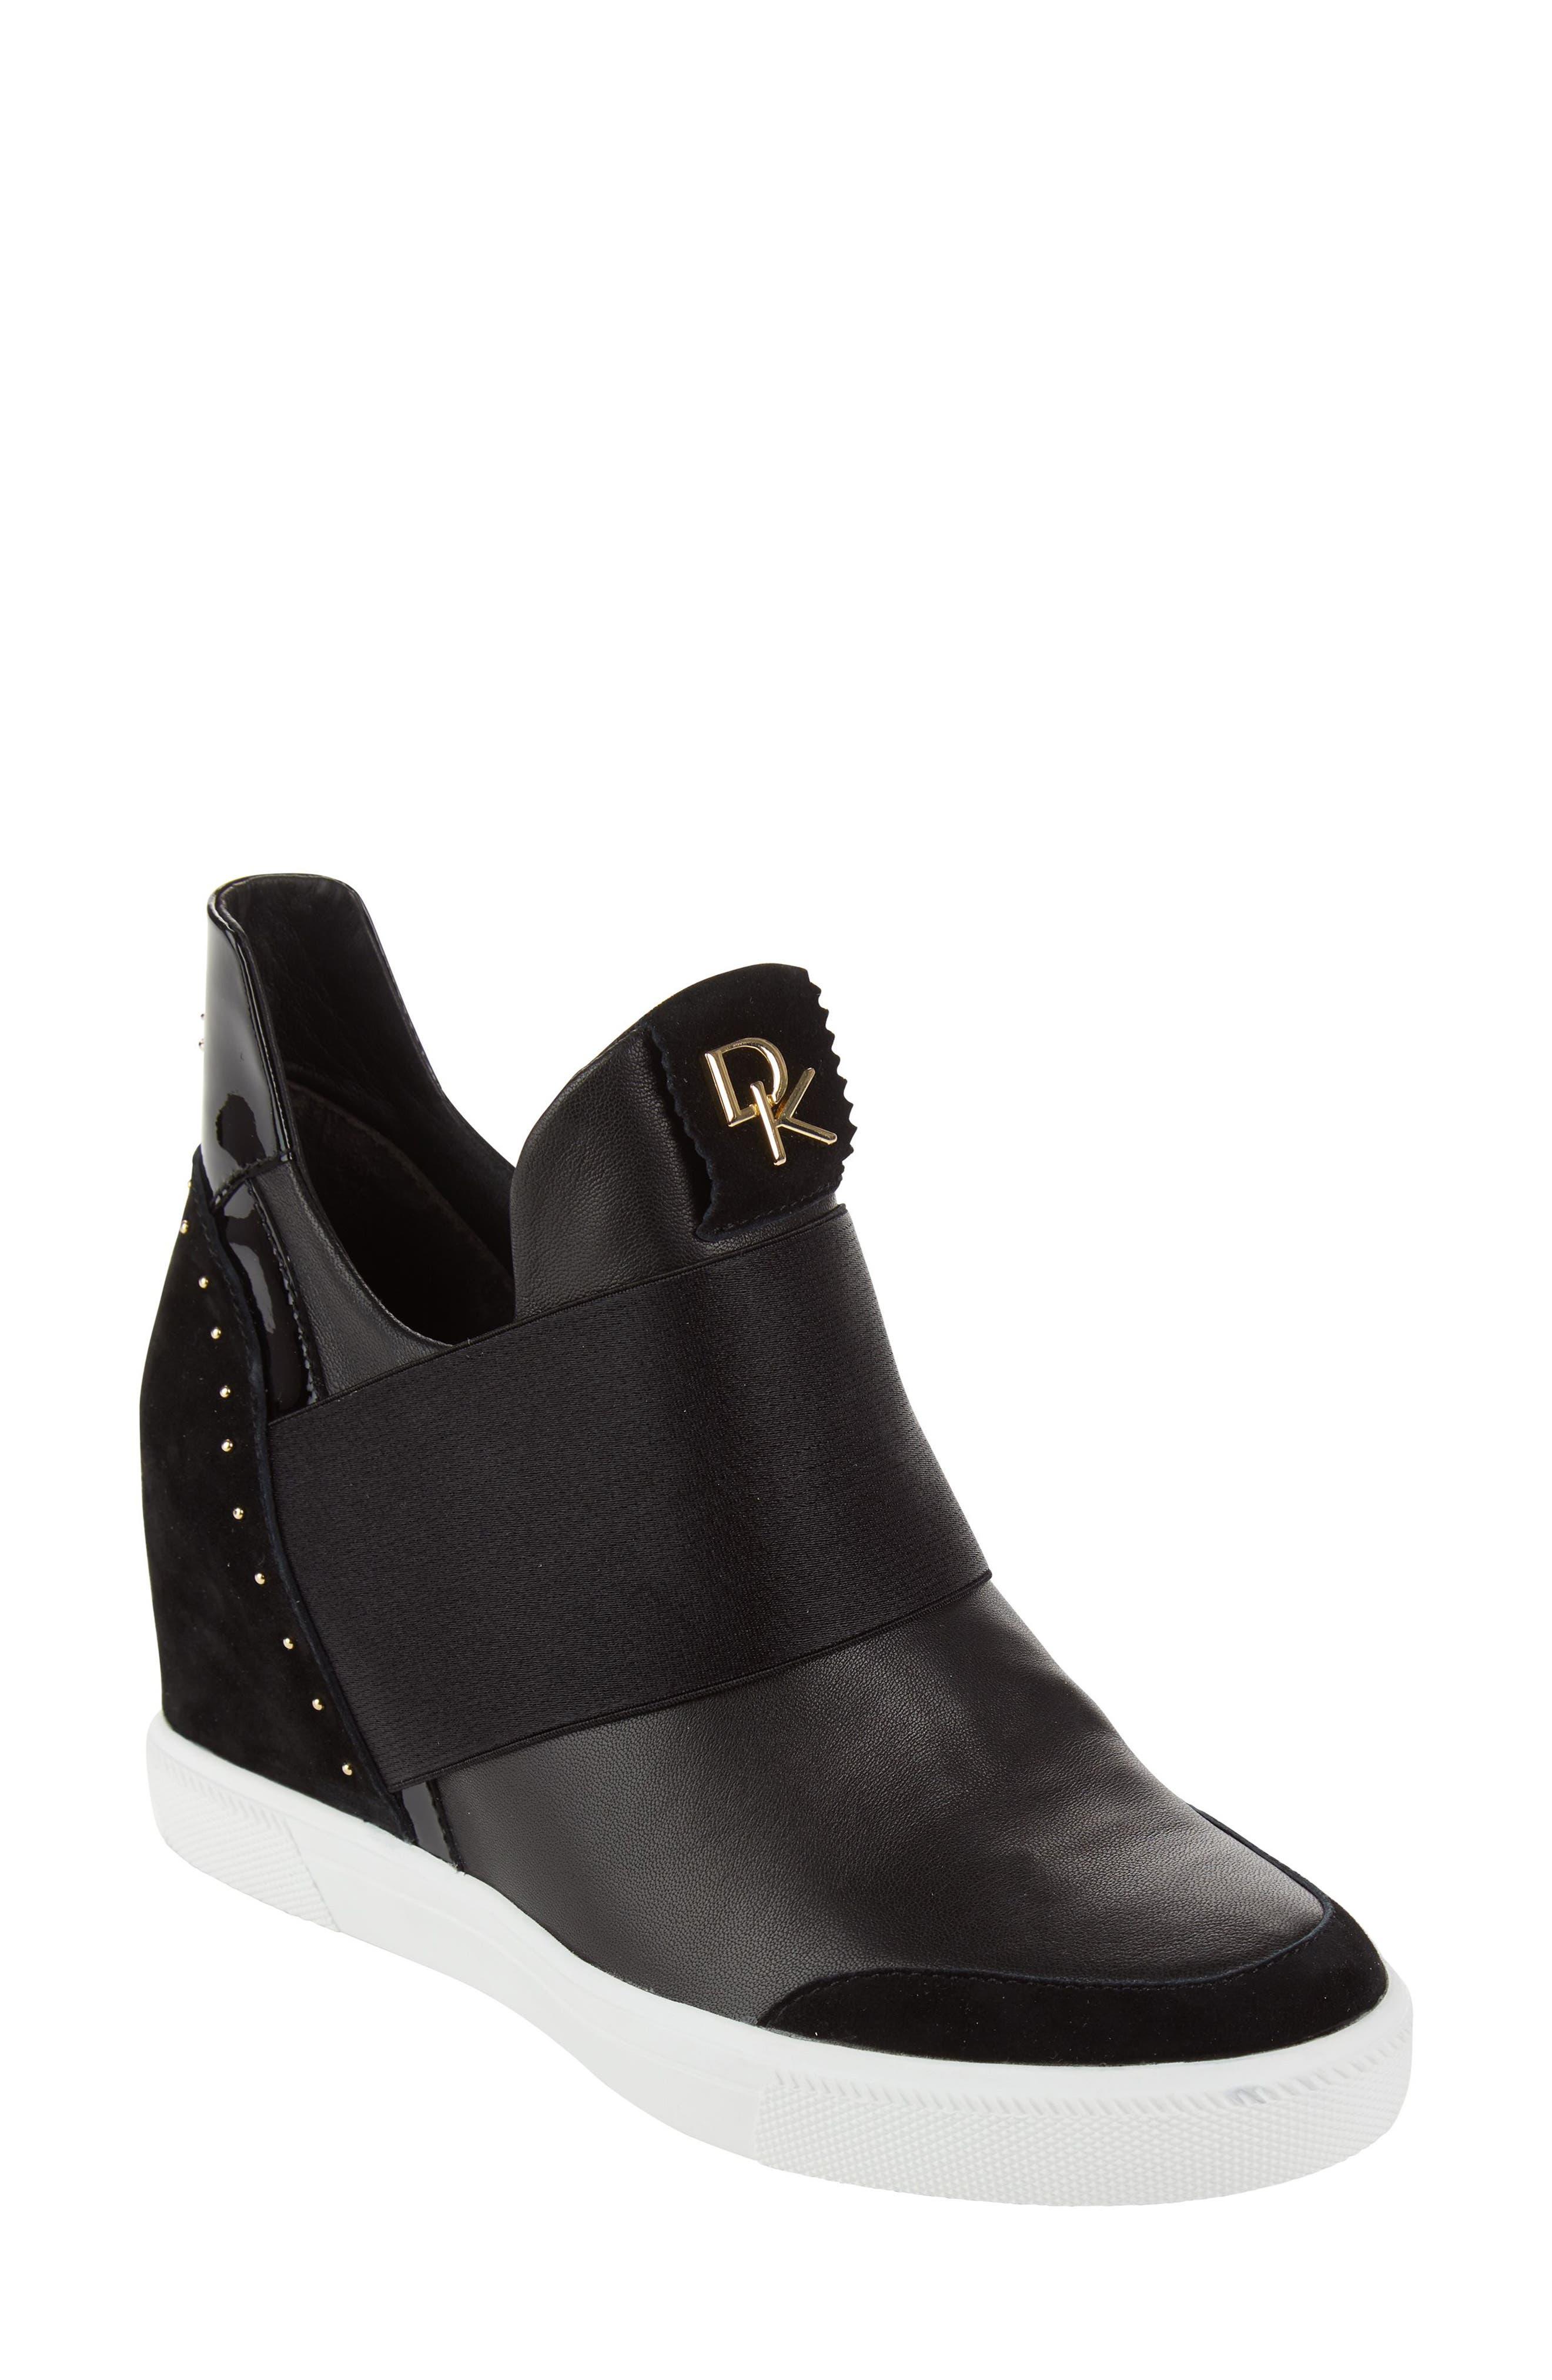 Donna Karan Cailin Studded Wedge Sneaker,                             Main thumbnail 1, color,                             BLACK LEATHER